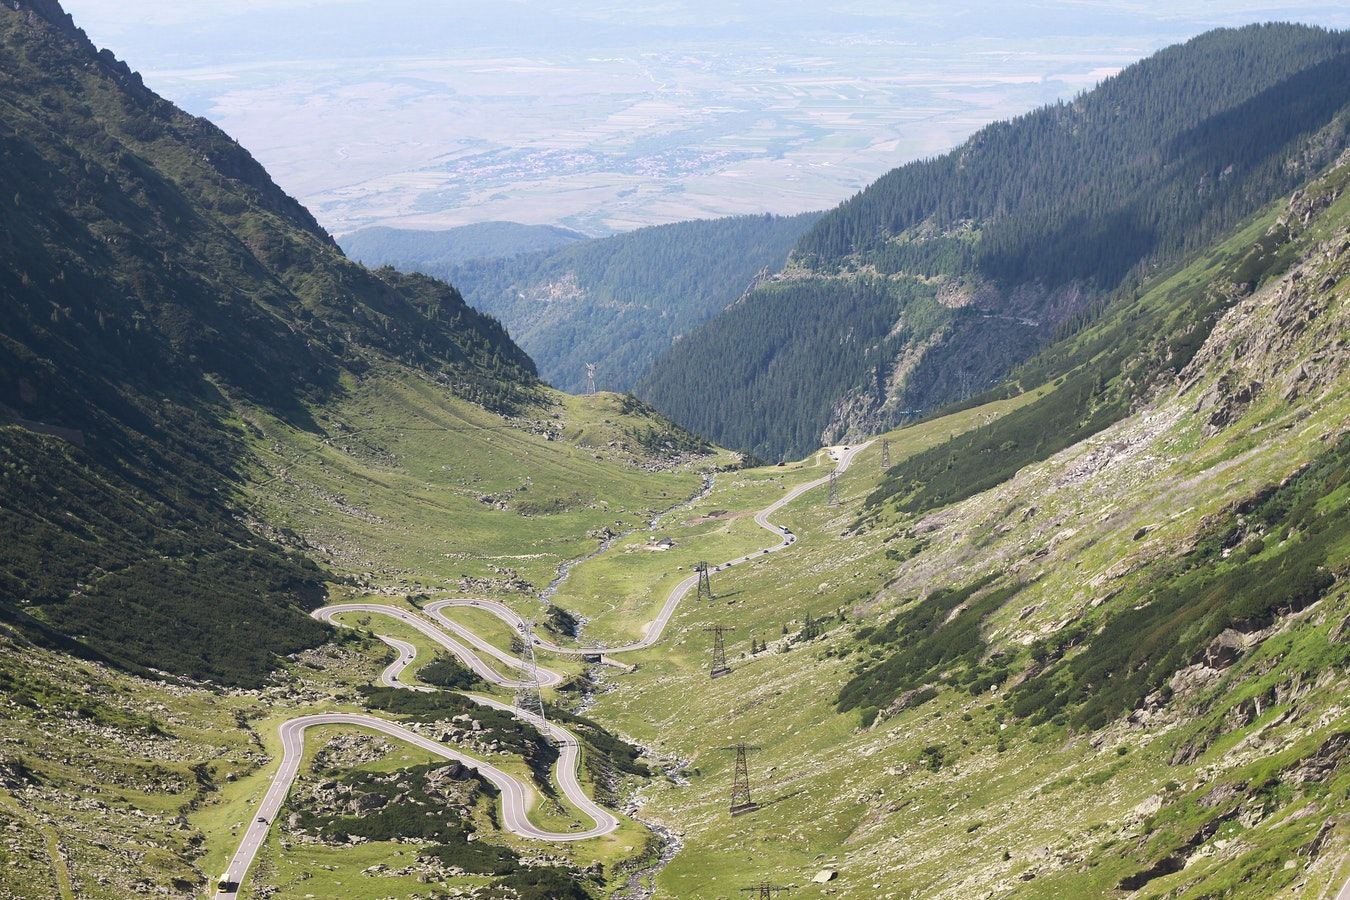 Fly Drive Roemenie Roemenie Vakantie Prachtige Landschappen